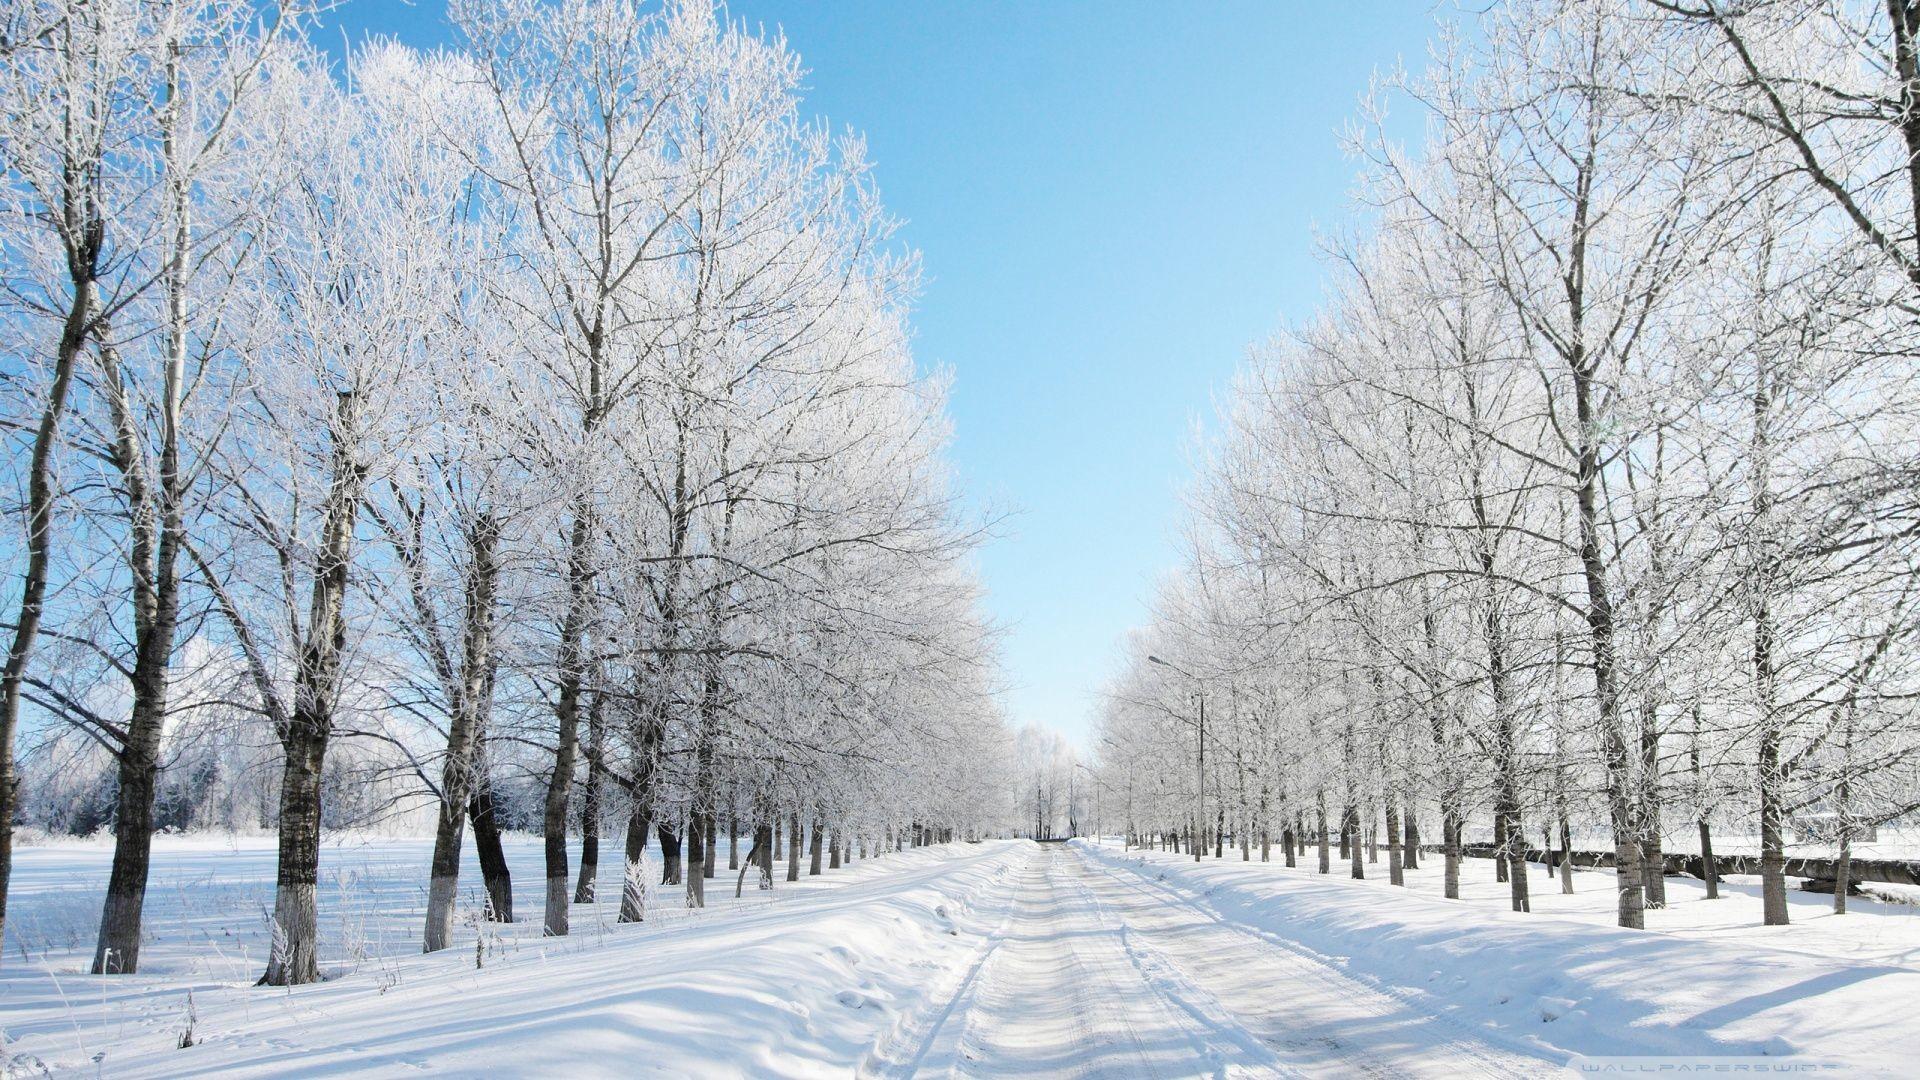 Res: 1920x1080, K Ultra HD Snow Wallpapers HD, Desktop Backgrounds 1920×1200 Snow Picture  Wallpapers (35 Wallpapers) | Adorable Wallpapers